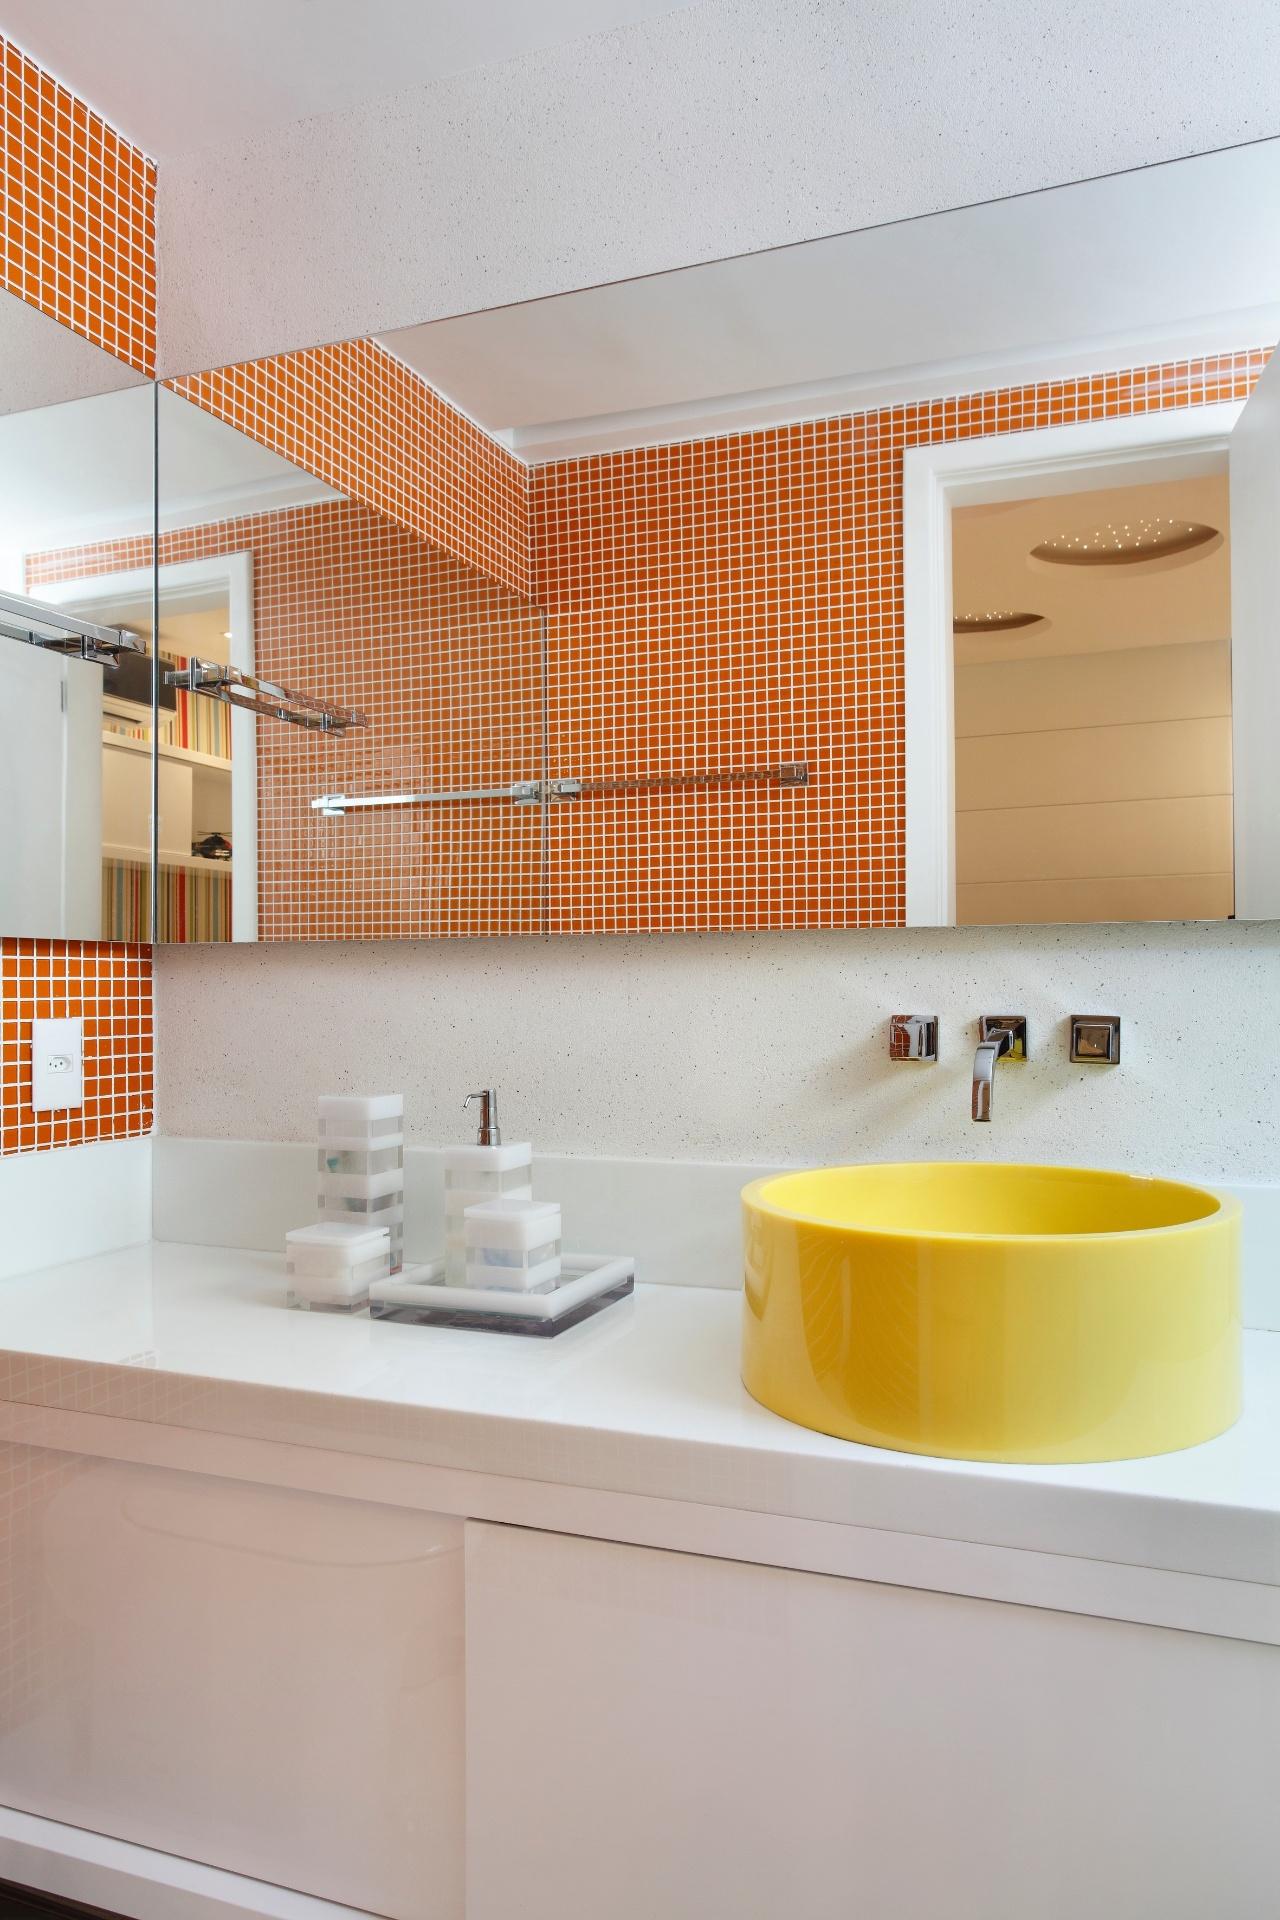 banheiro casal duas cubas